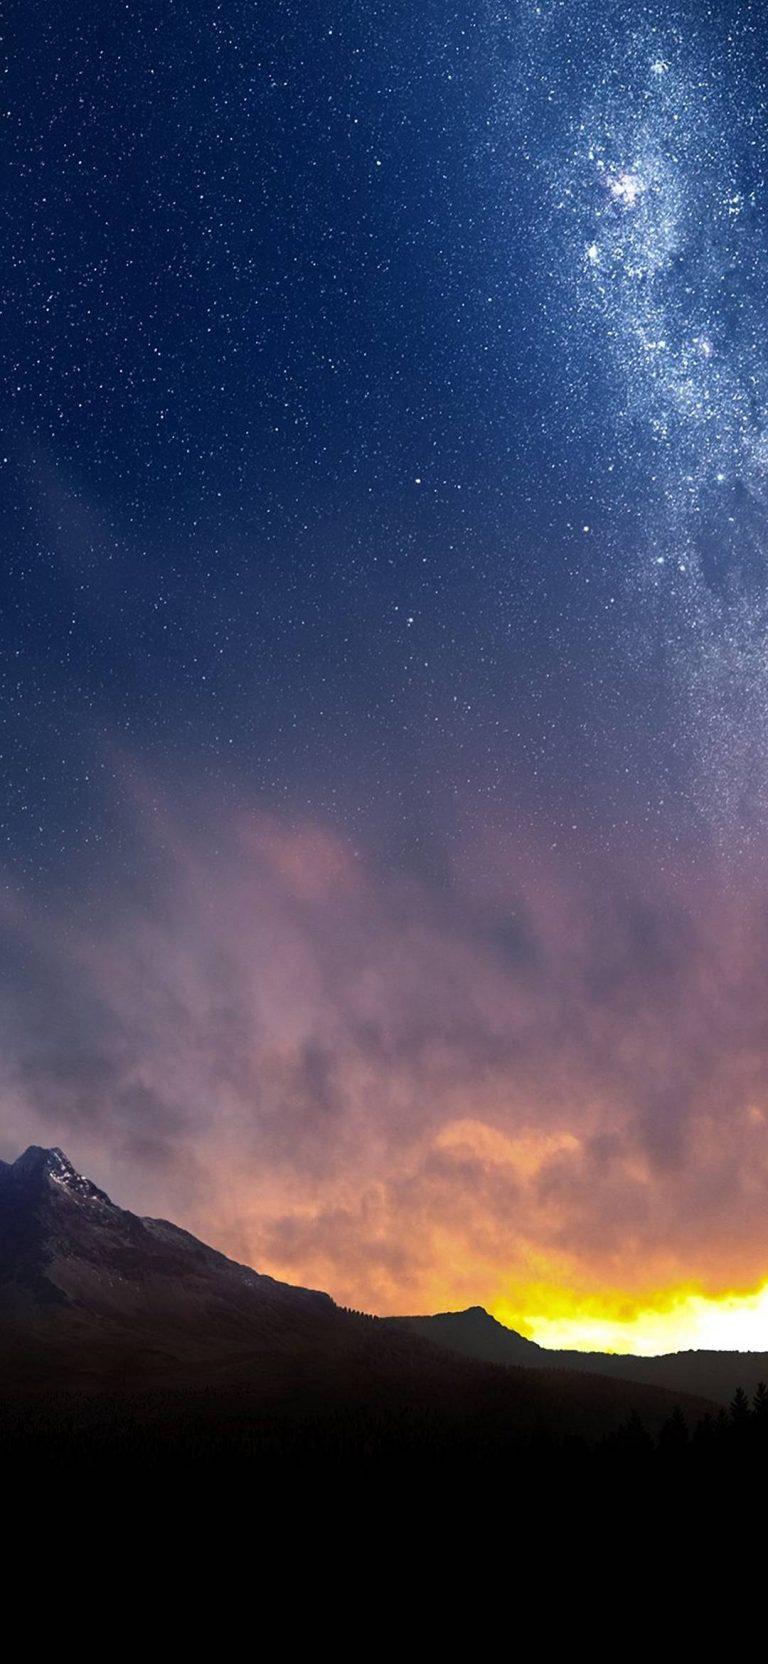 Swiss Night Sky 1080x2340 768x1664